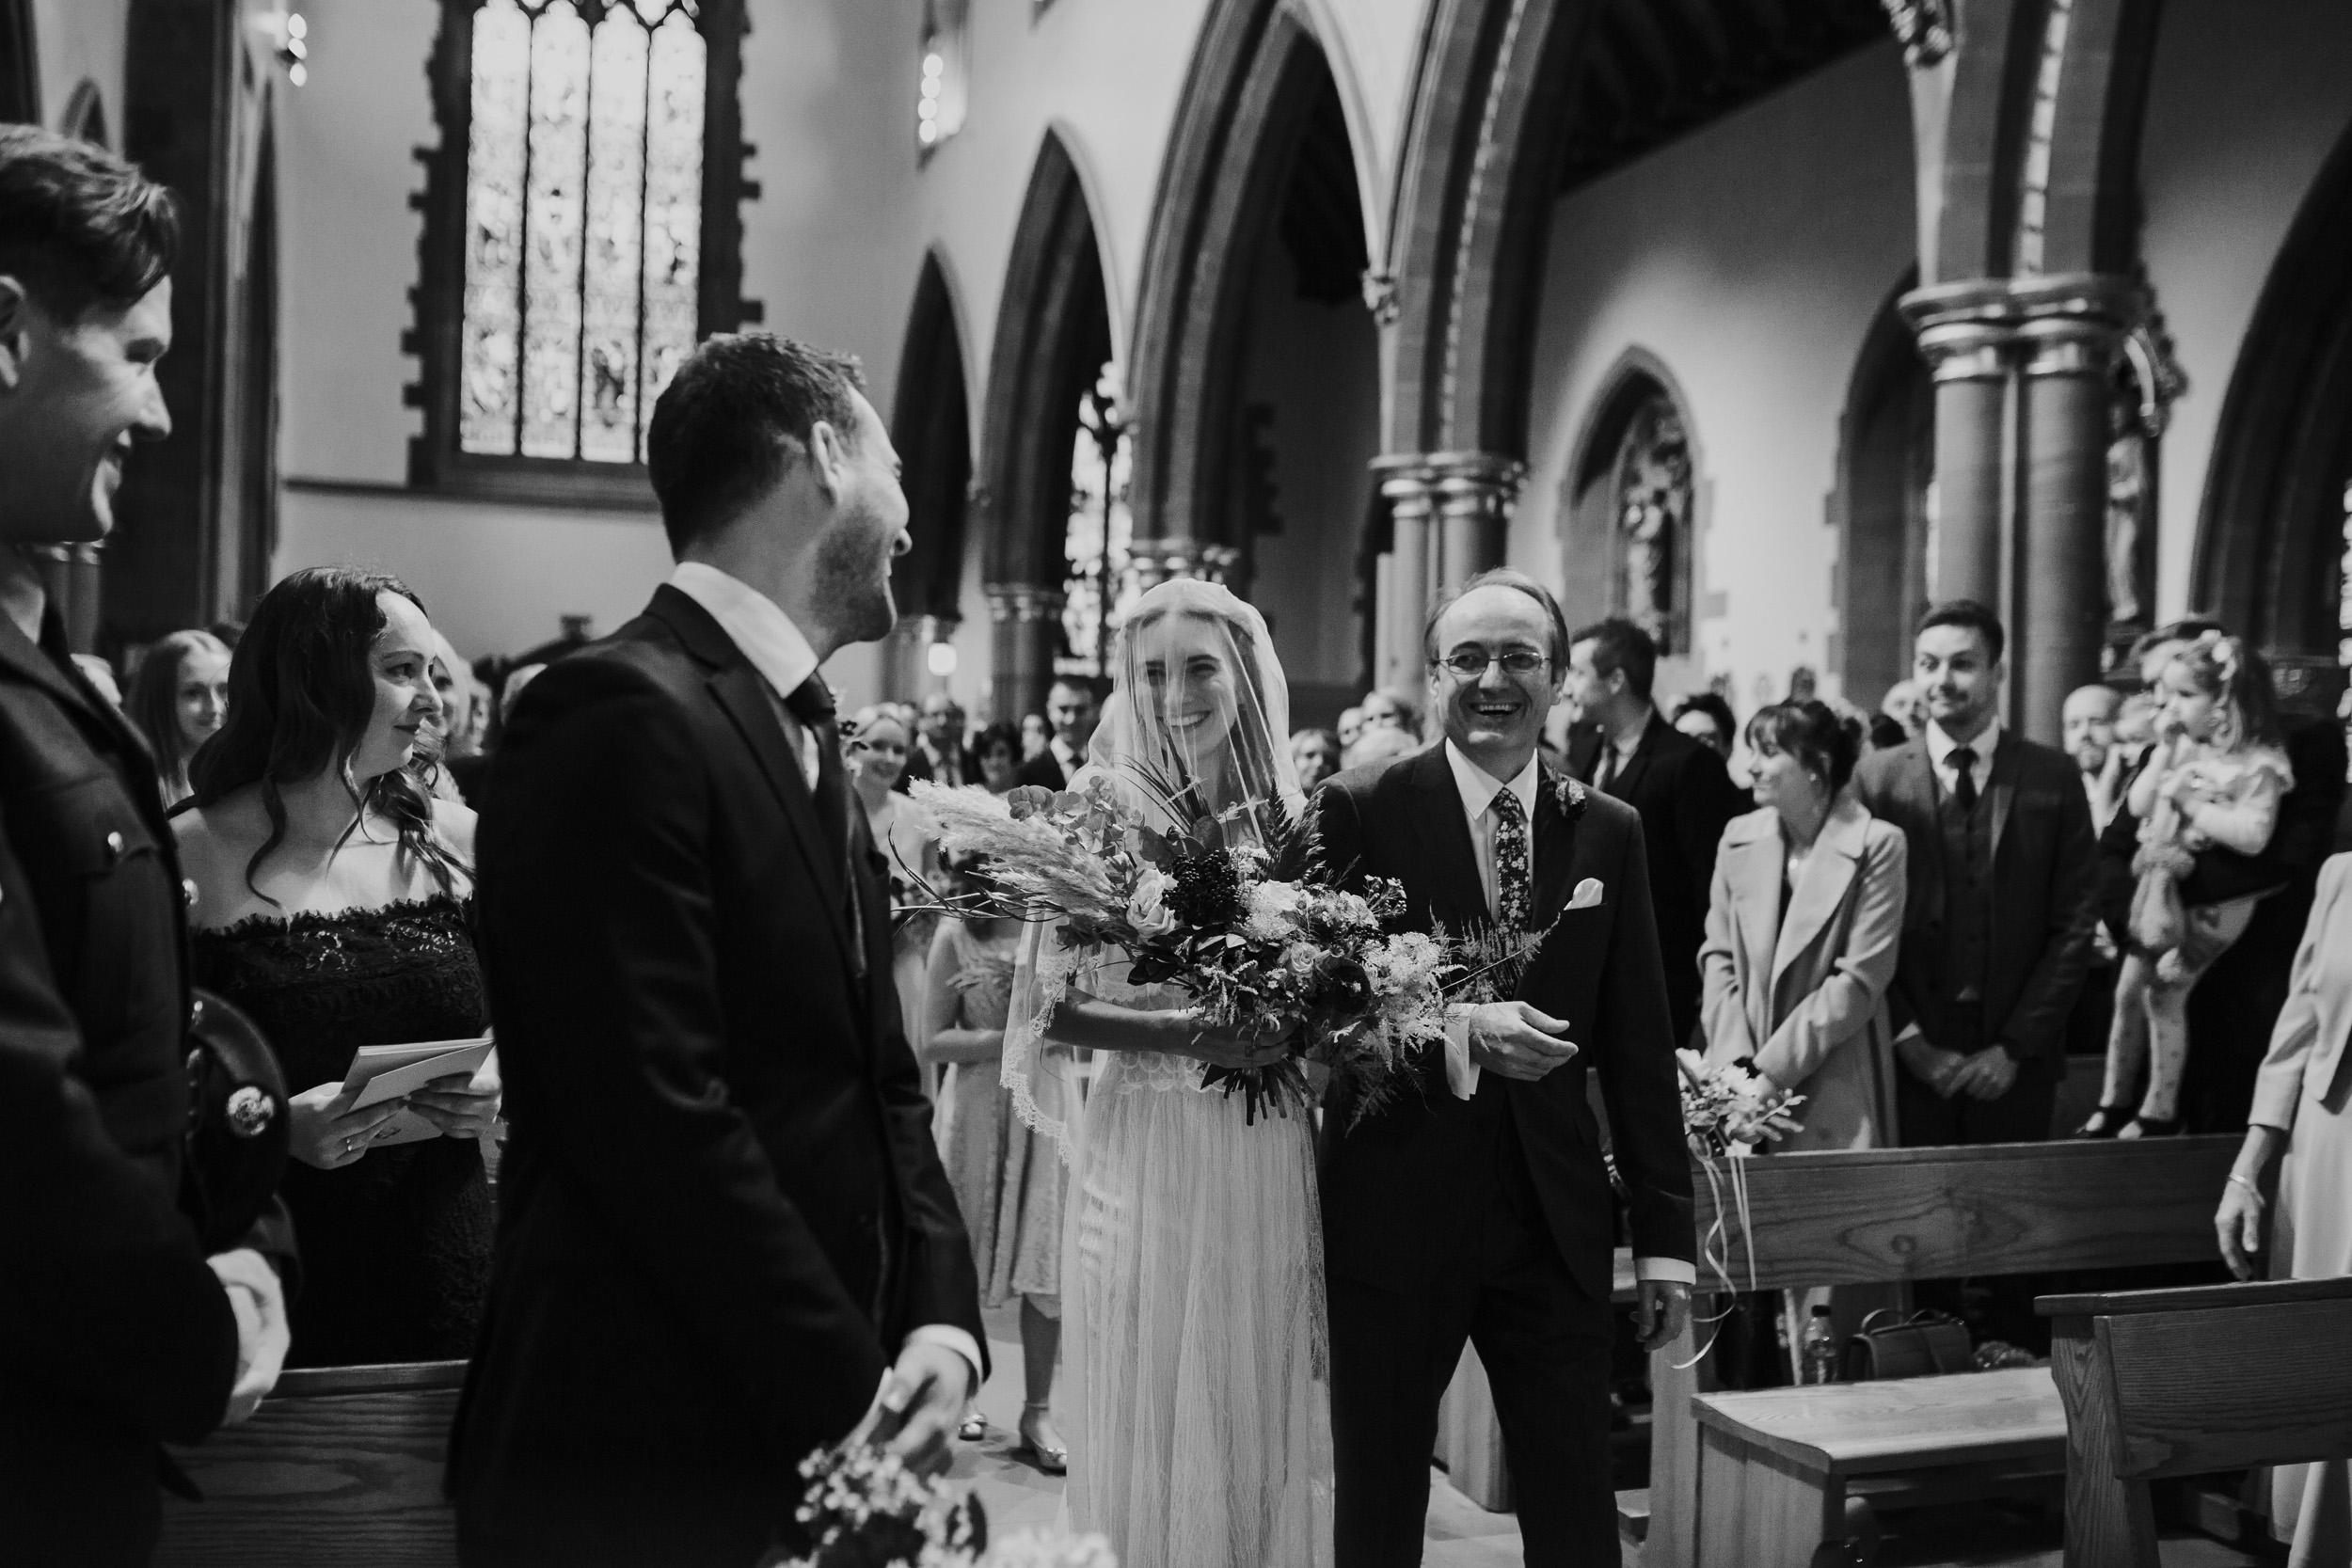 Joasia-Kate-Beaumont-Bohemian-Lace-Wedding-Dress-Peak-District-Sheffield-Wedding-7.jpg